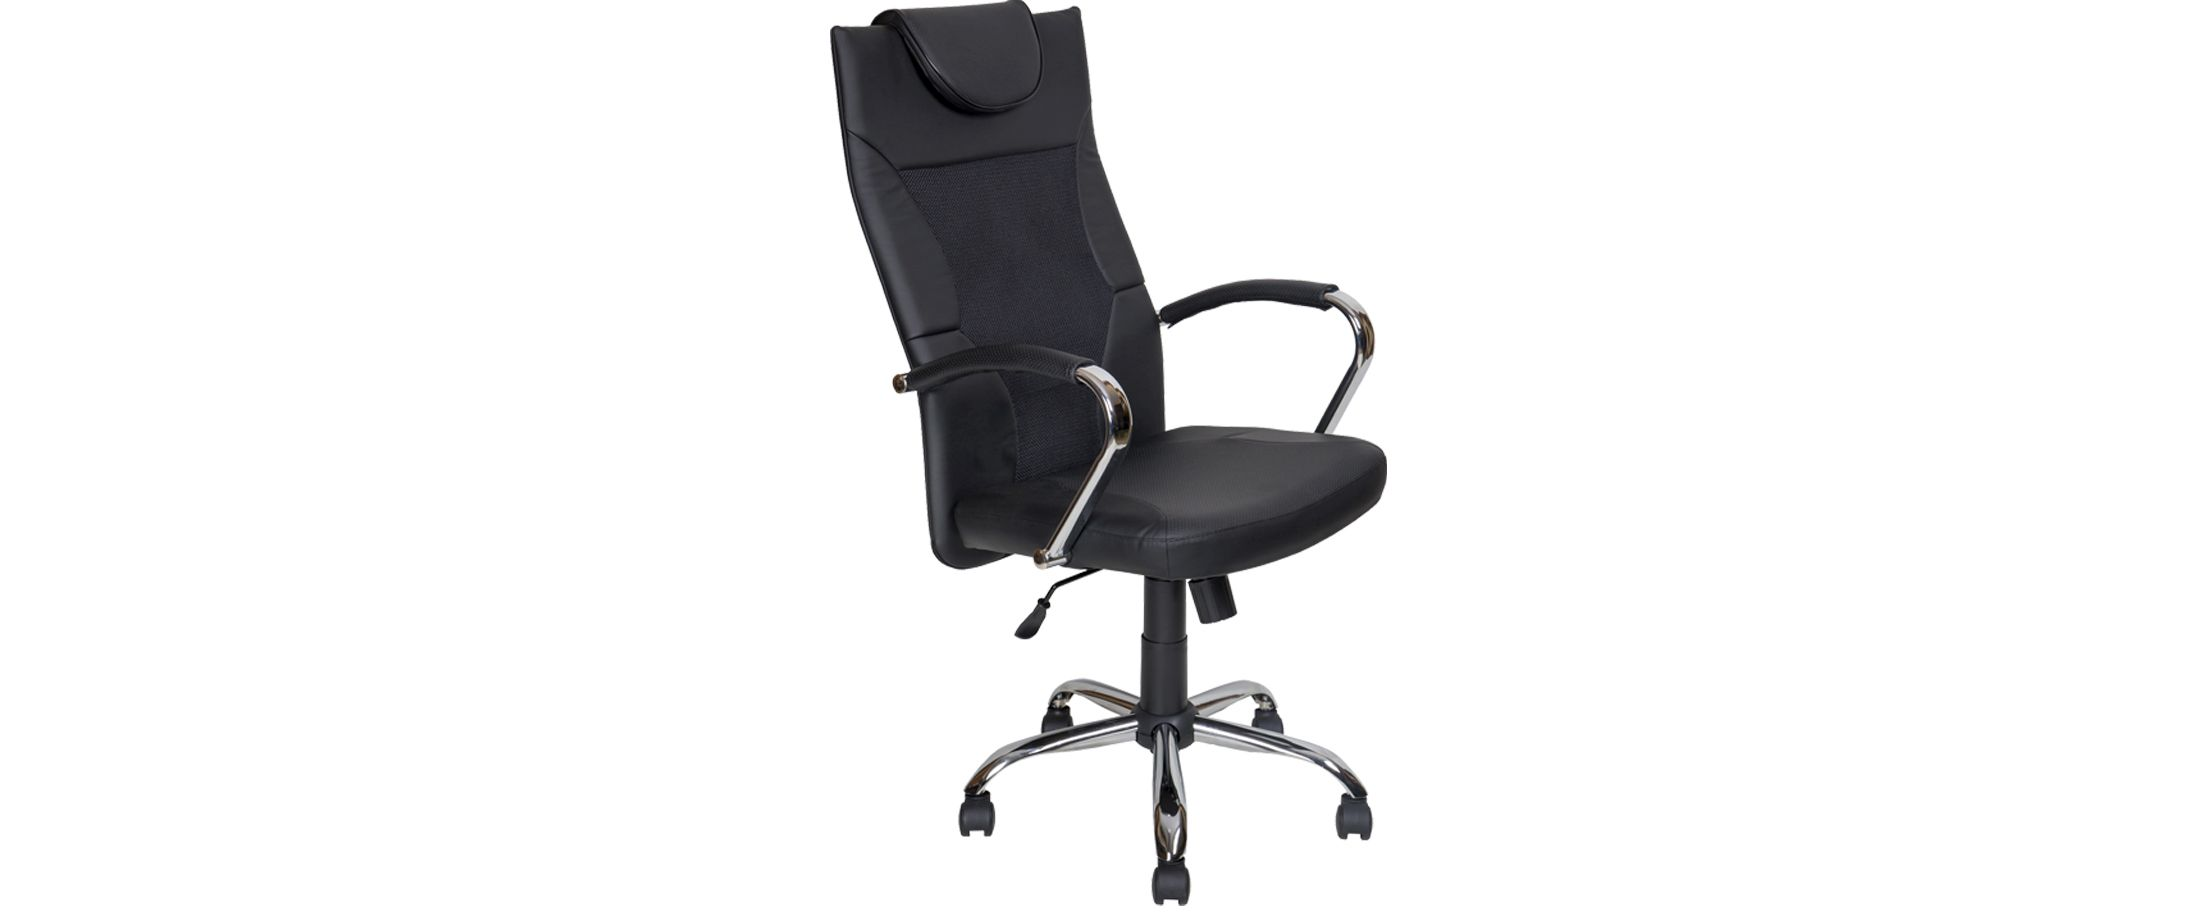 Кресло офисное AV 134 сетка черная Модель 999Кресло офисное AV 134 сетка черная Модель 999. Артикул Д000724<br>